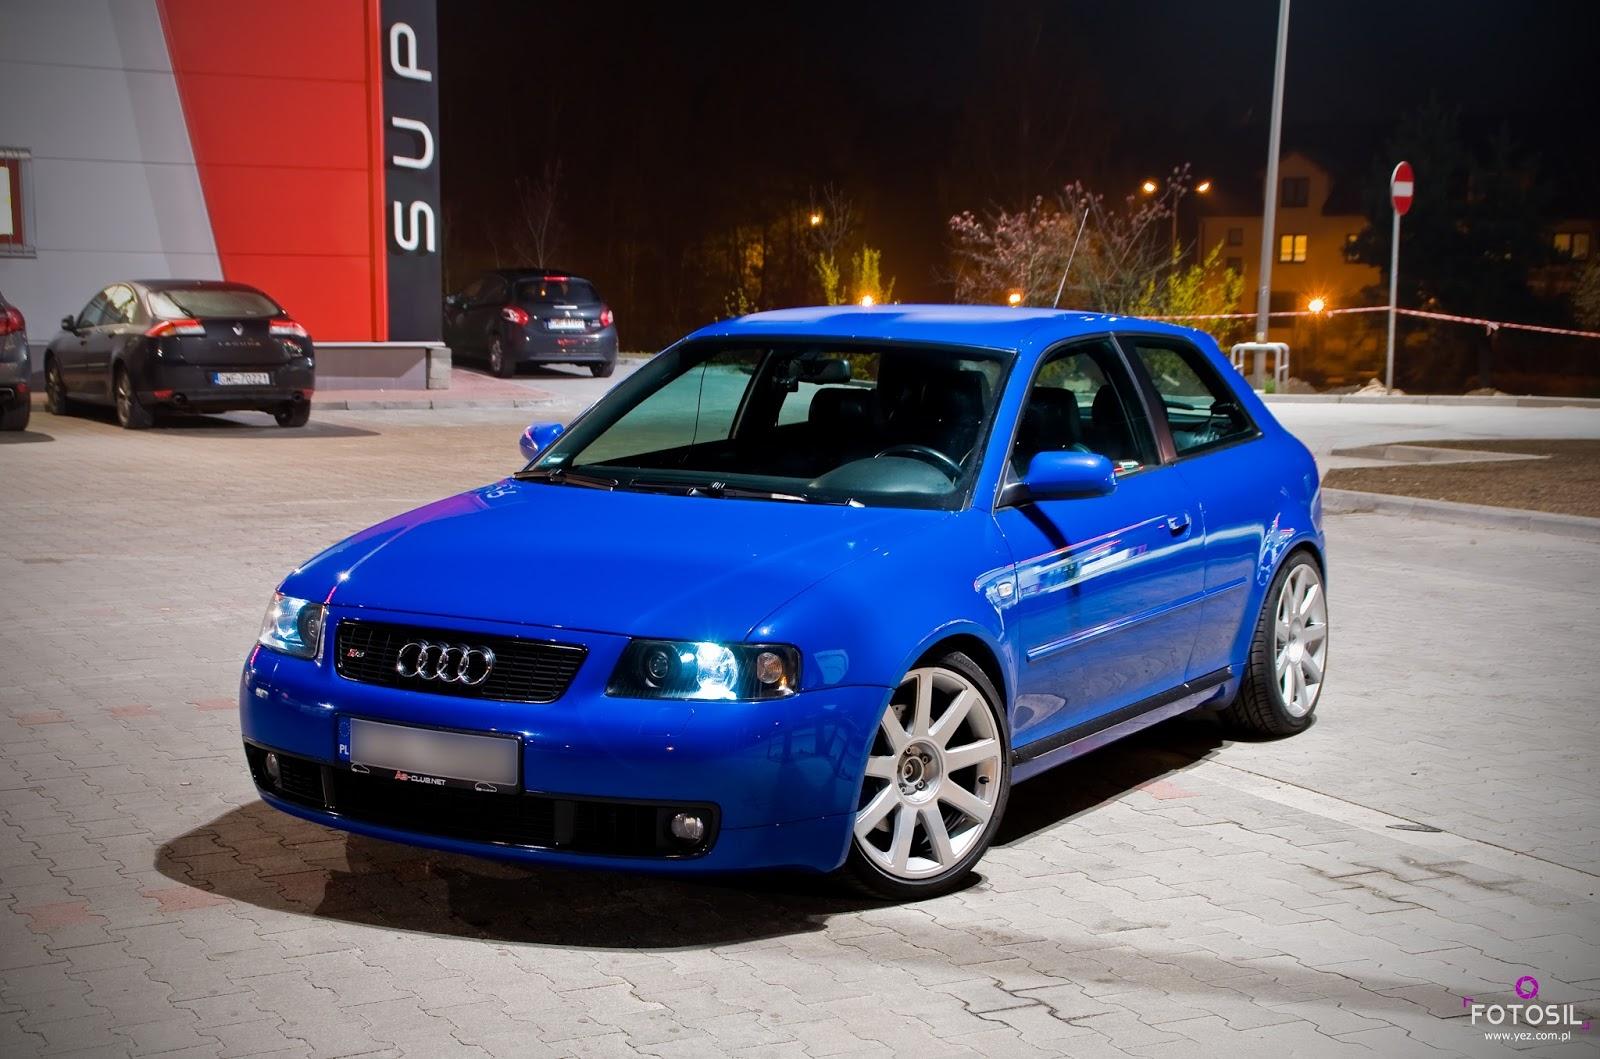 Kekurangan Audi S3 1.8 T Spesifikasi